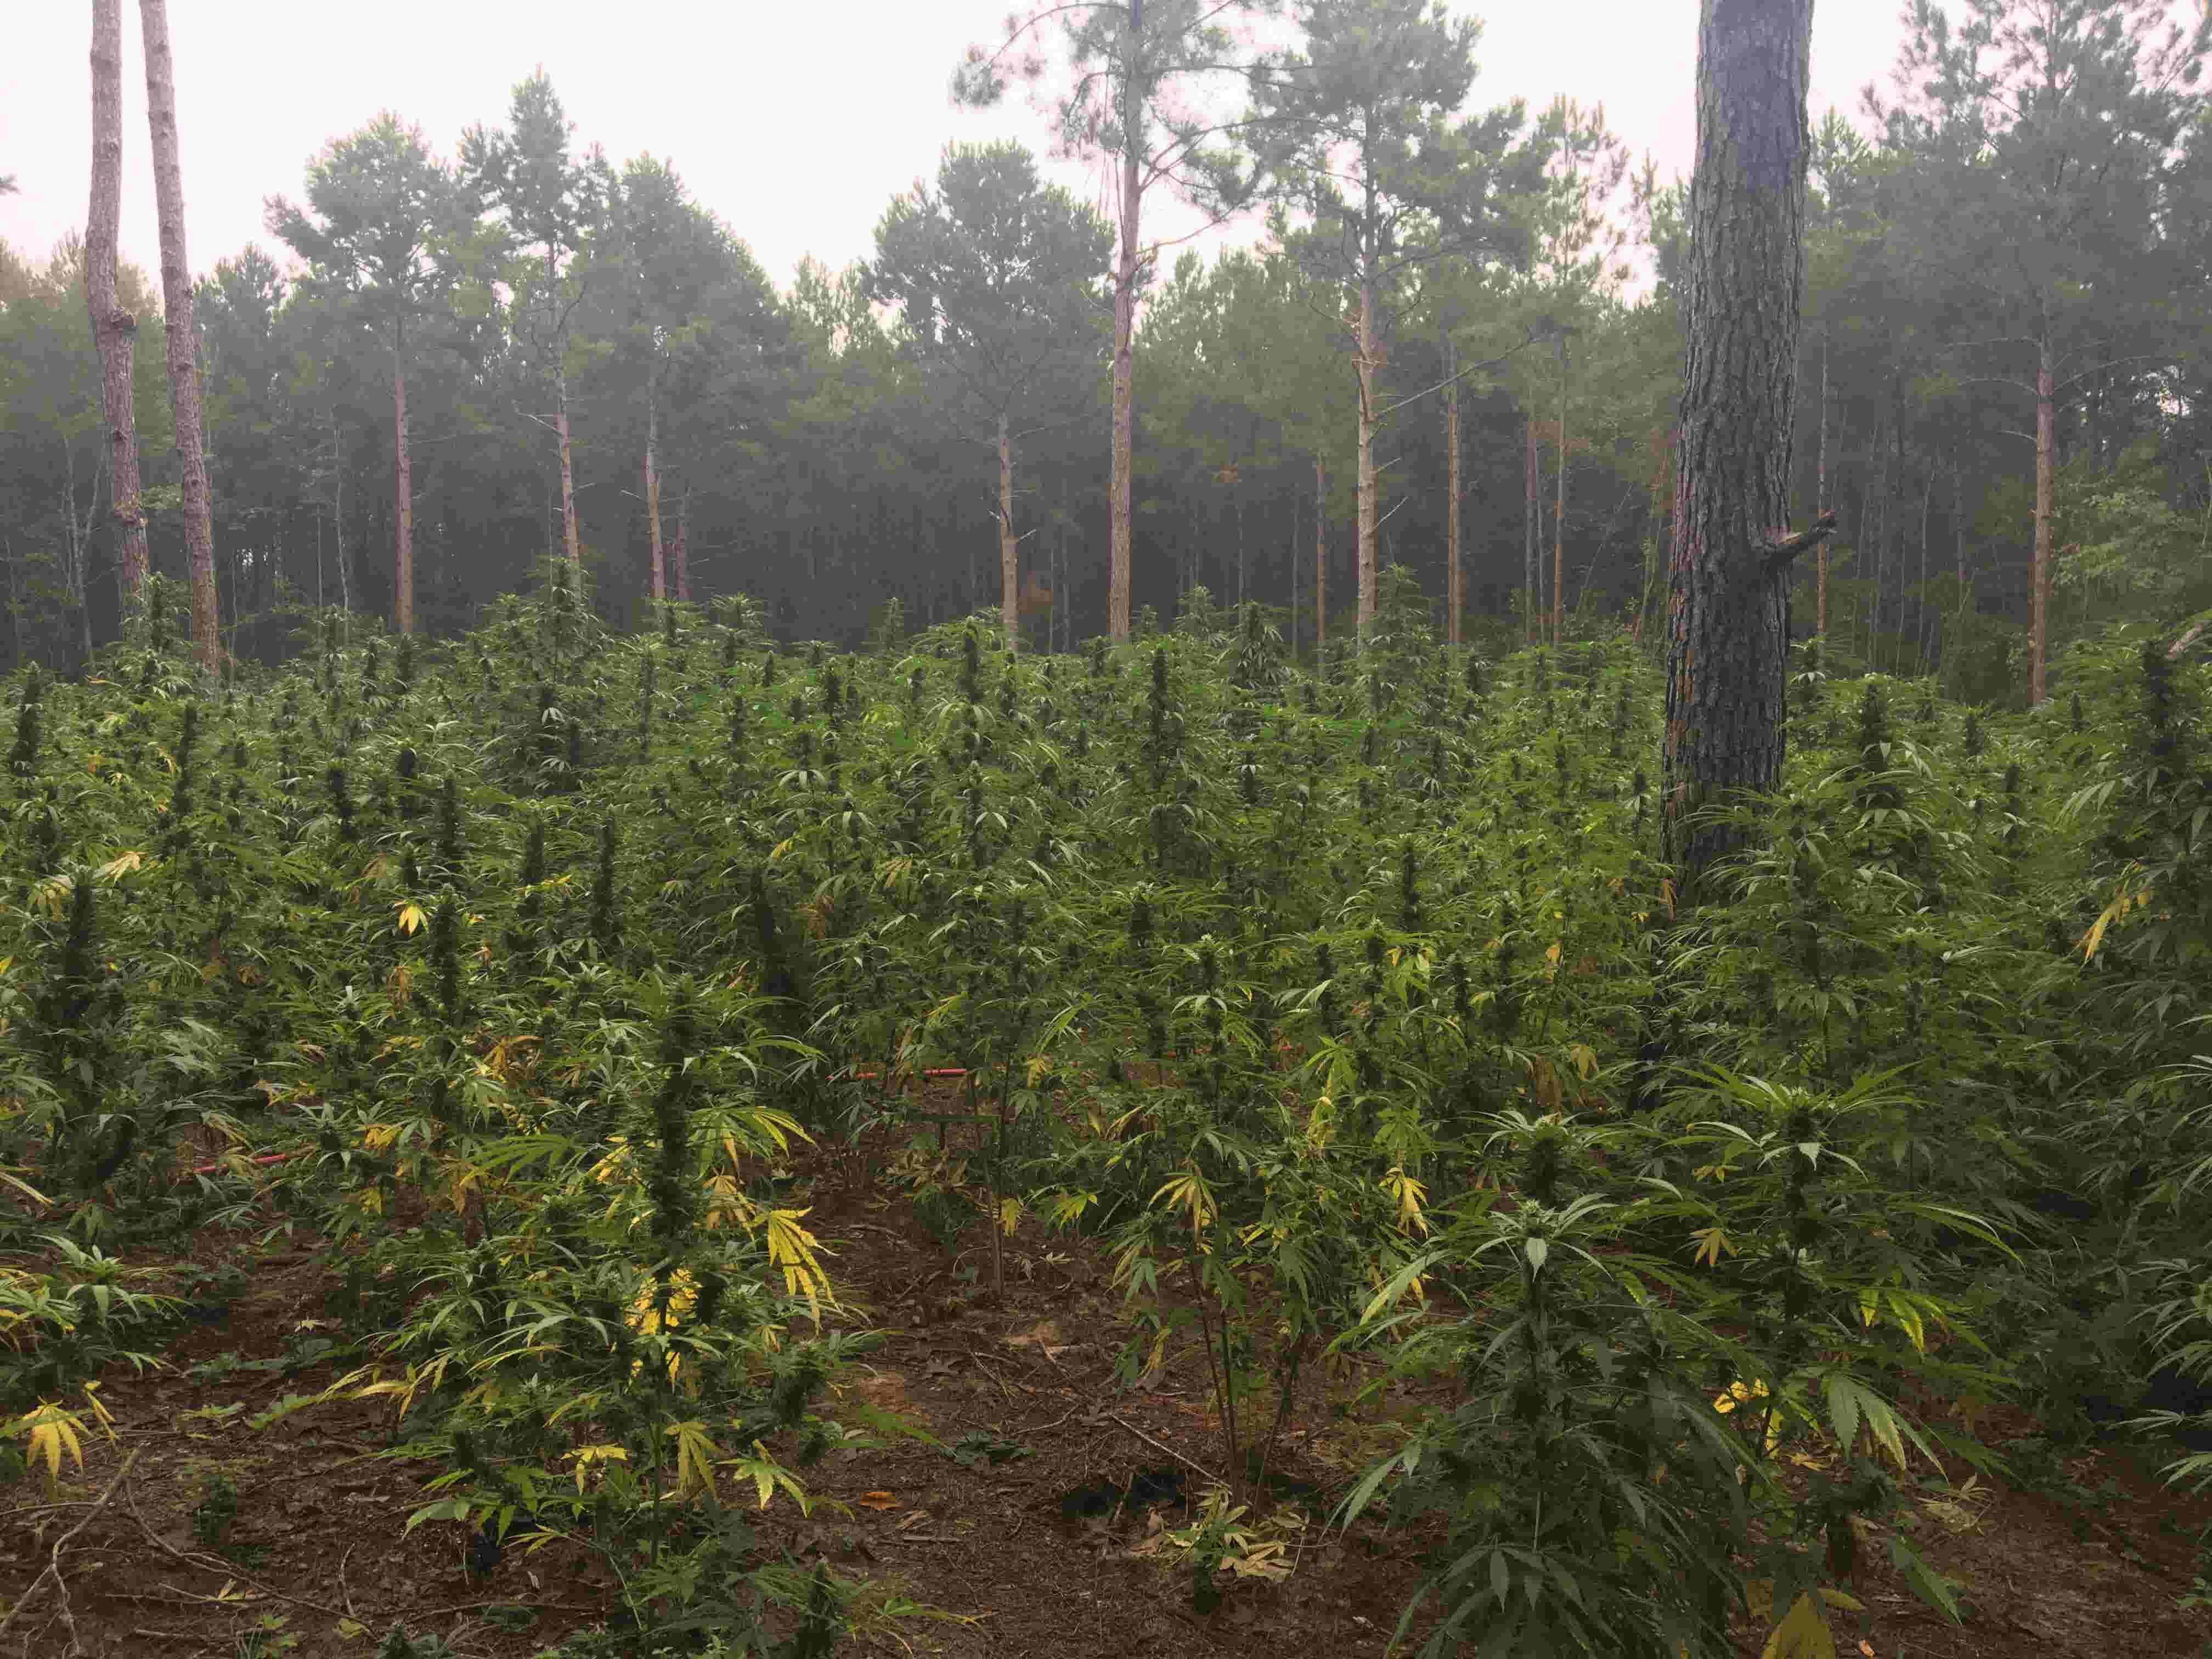 Around 70,000 marijuana plants found in pot grow in south Mississippi